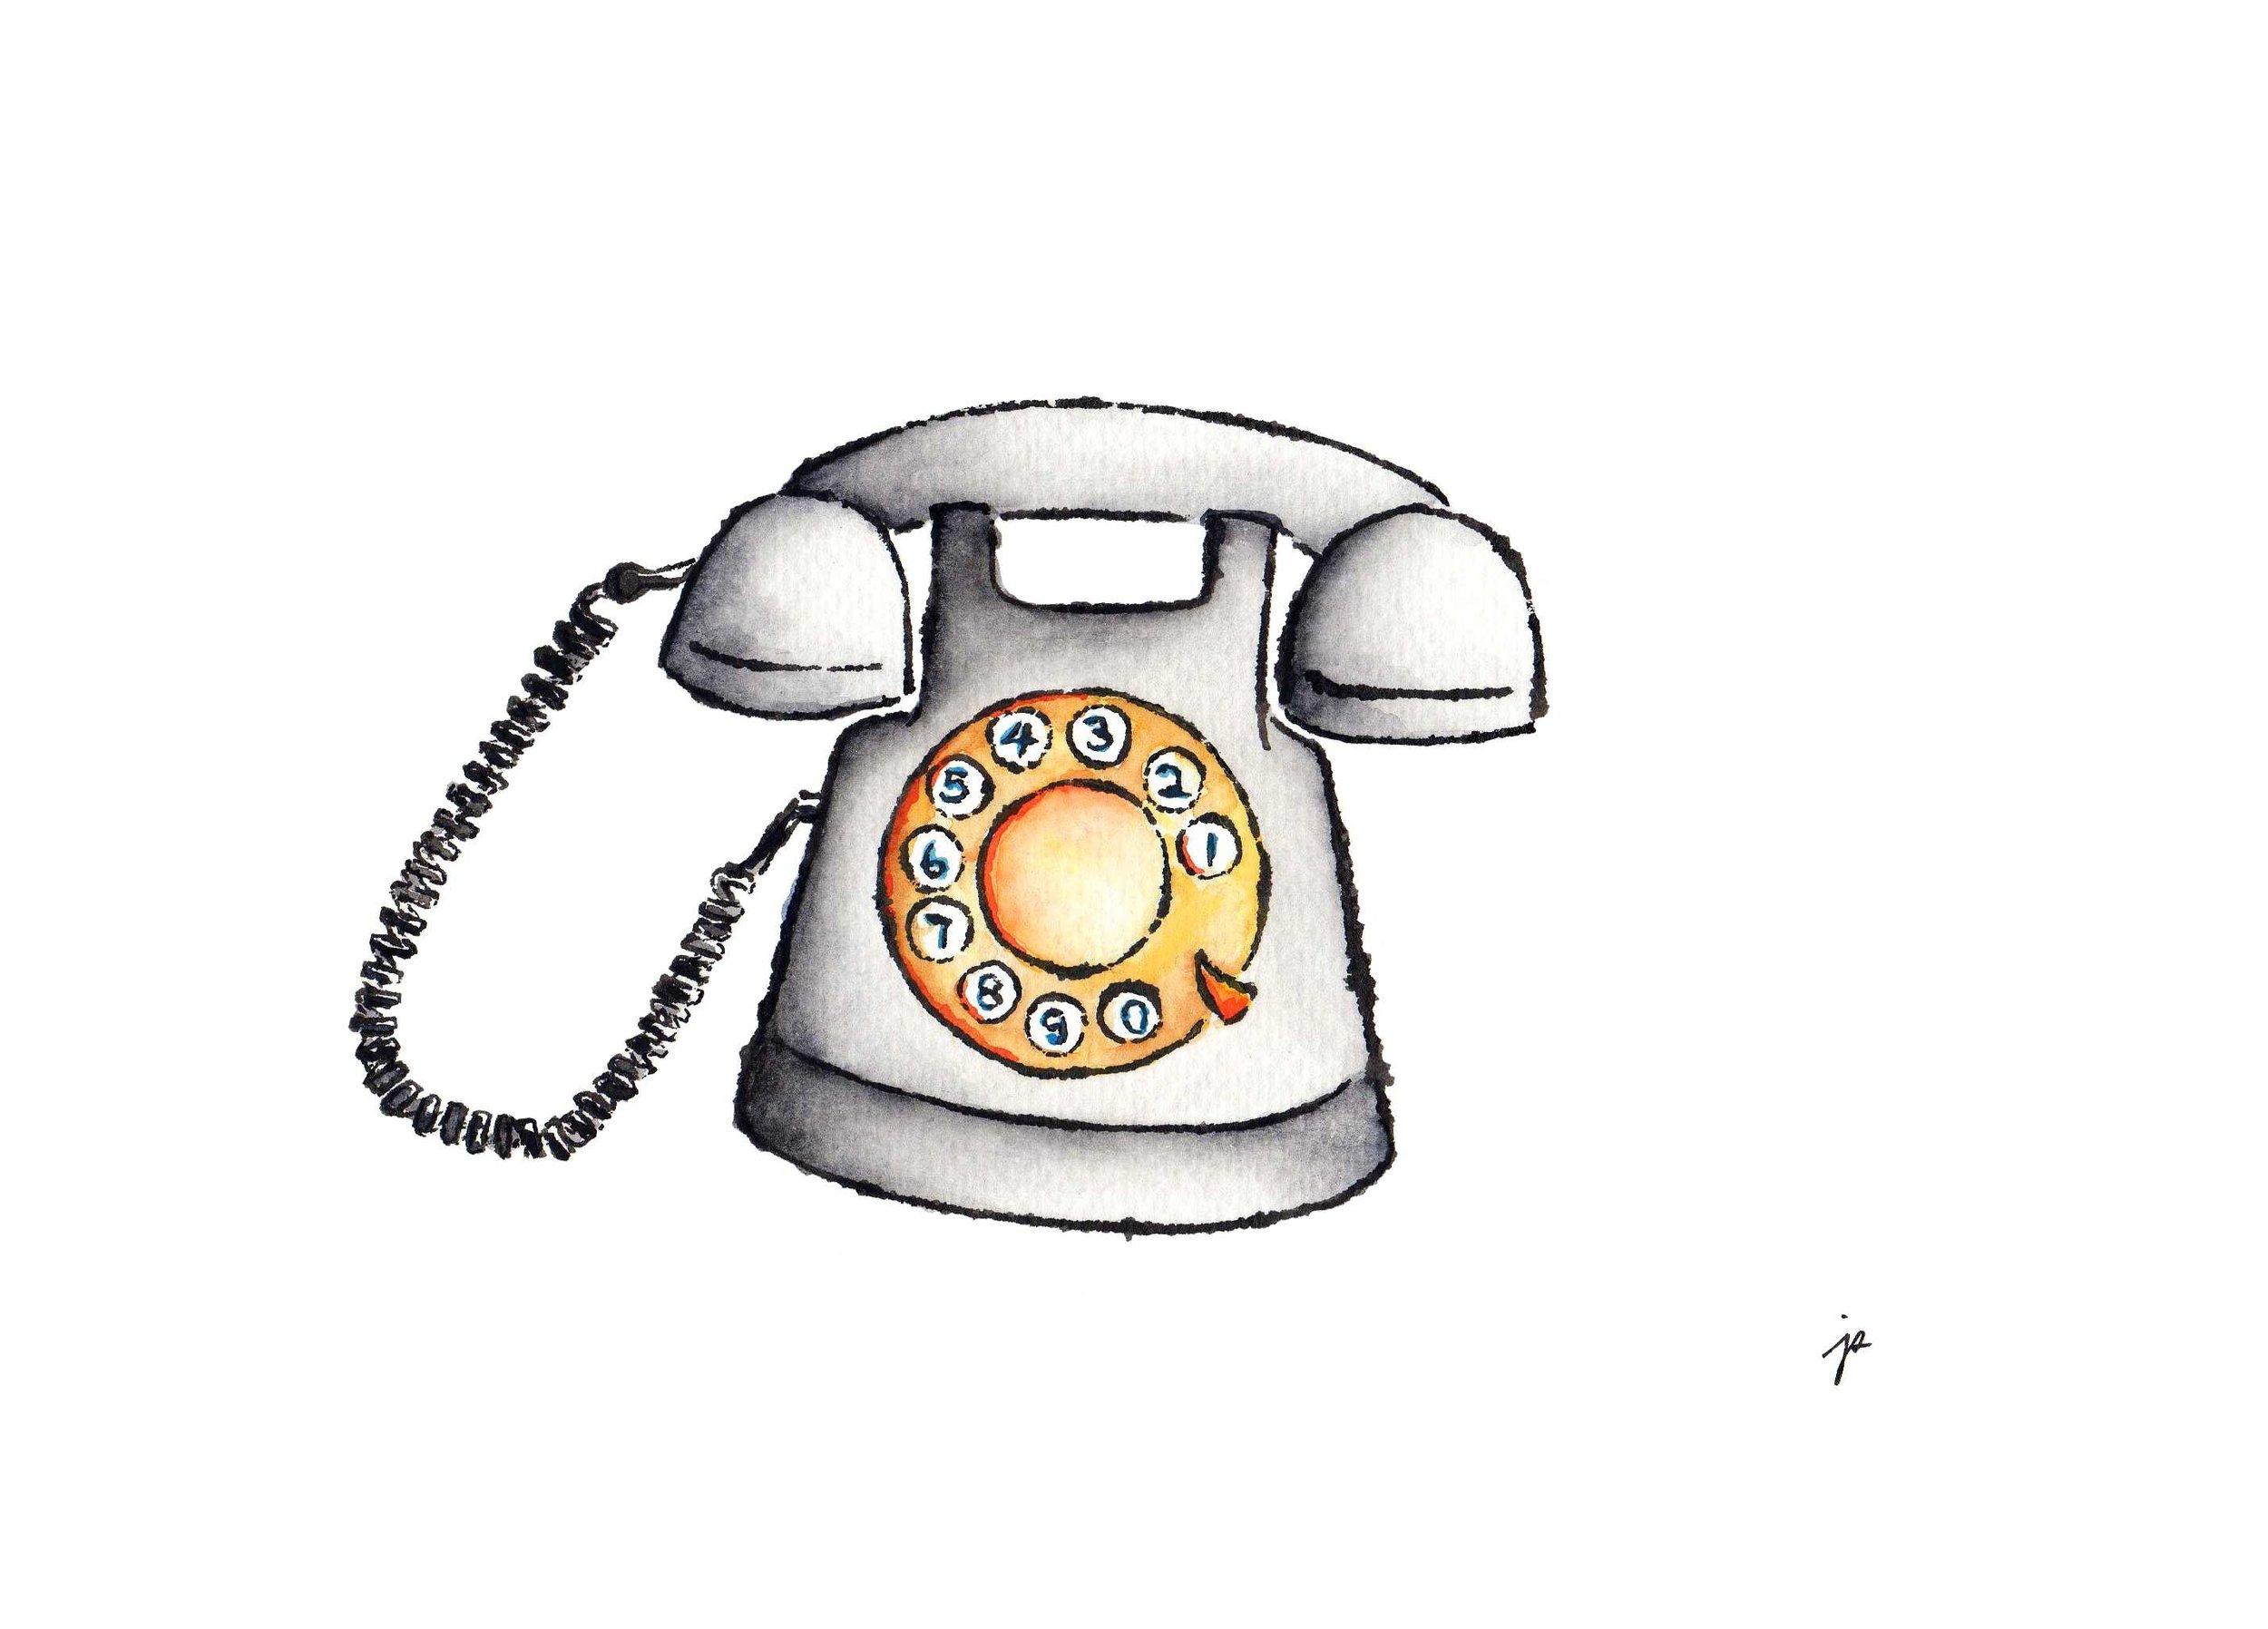 telephone_jodisam.jpg